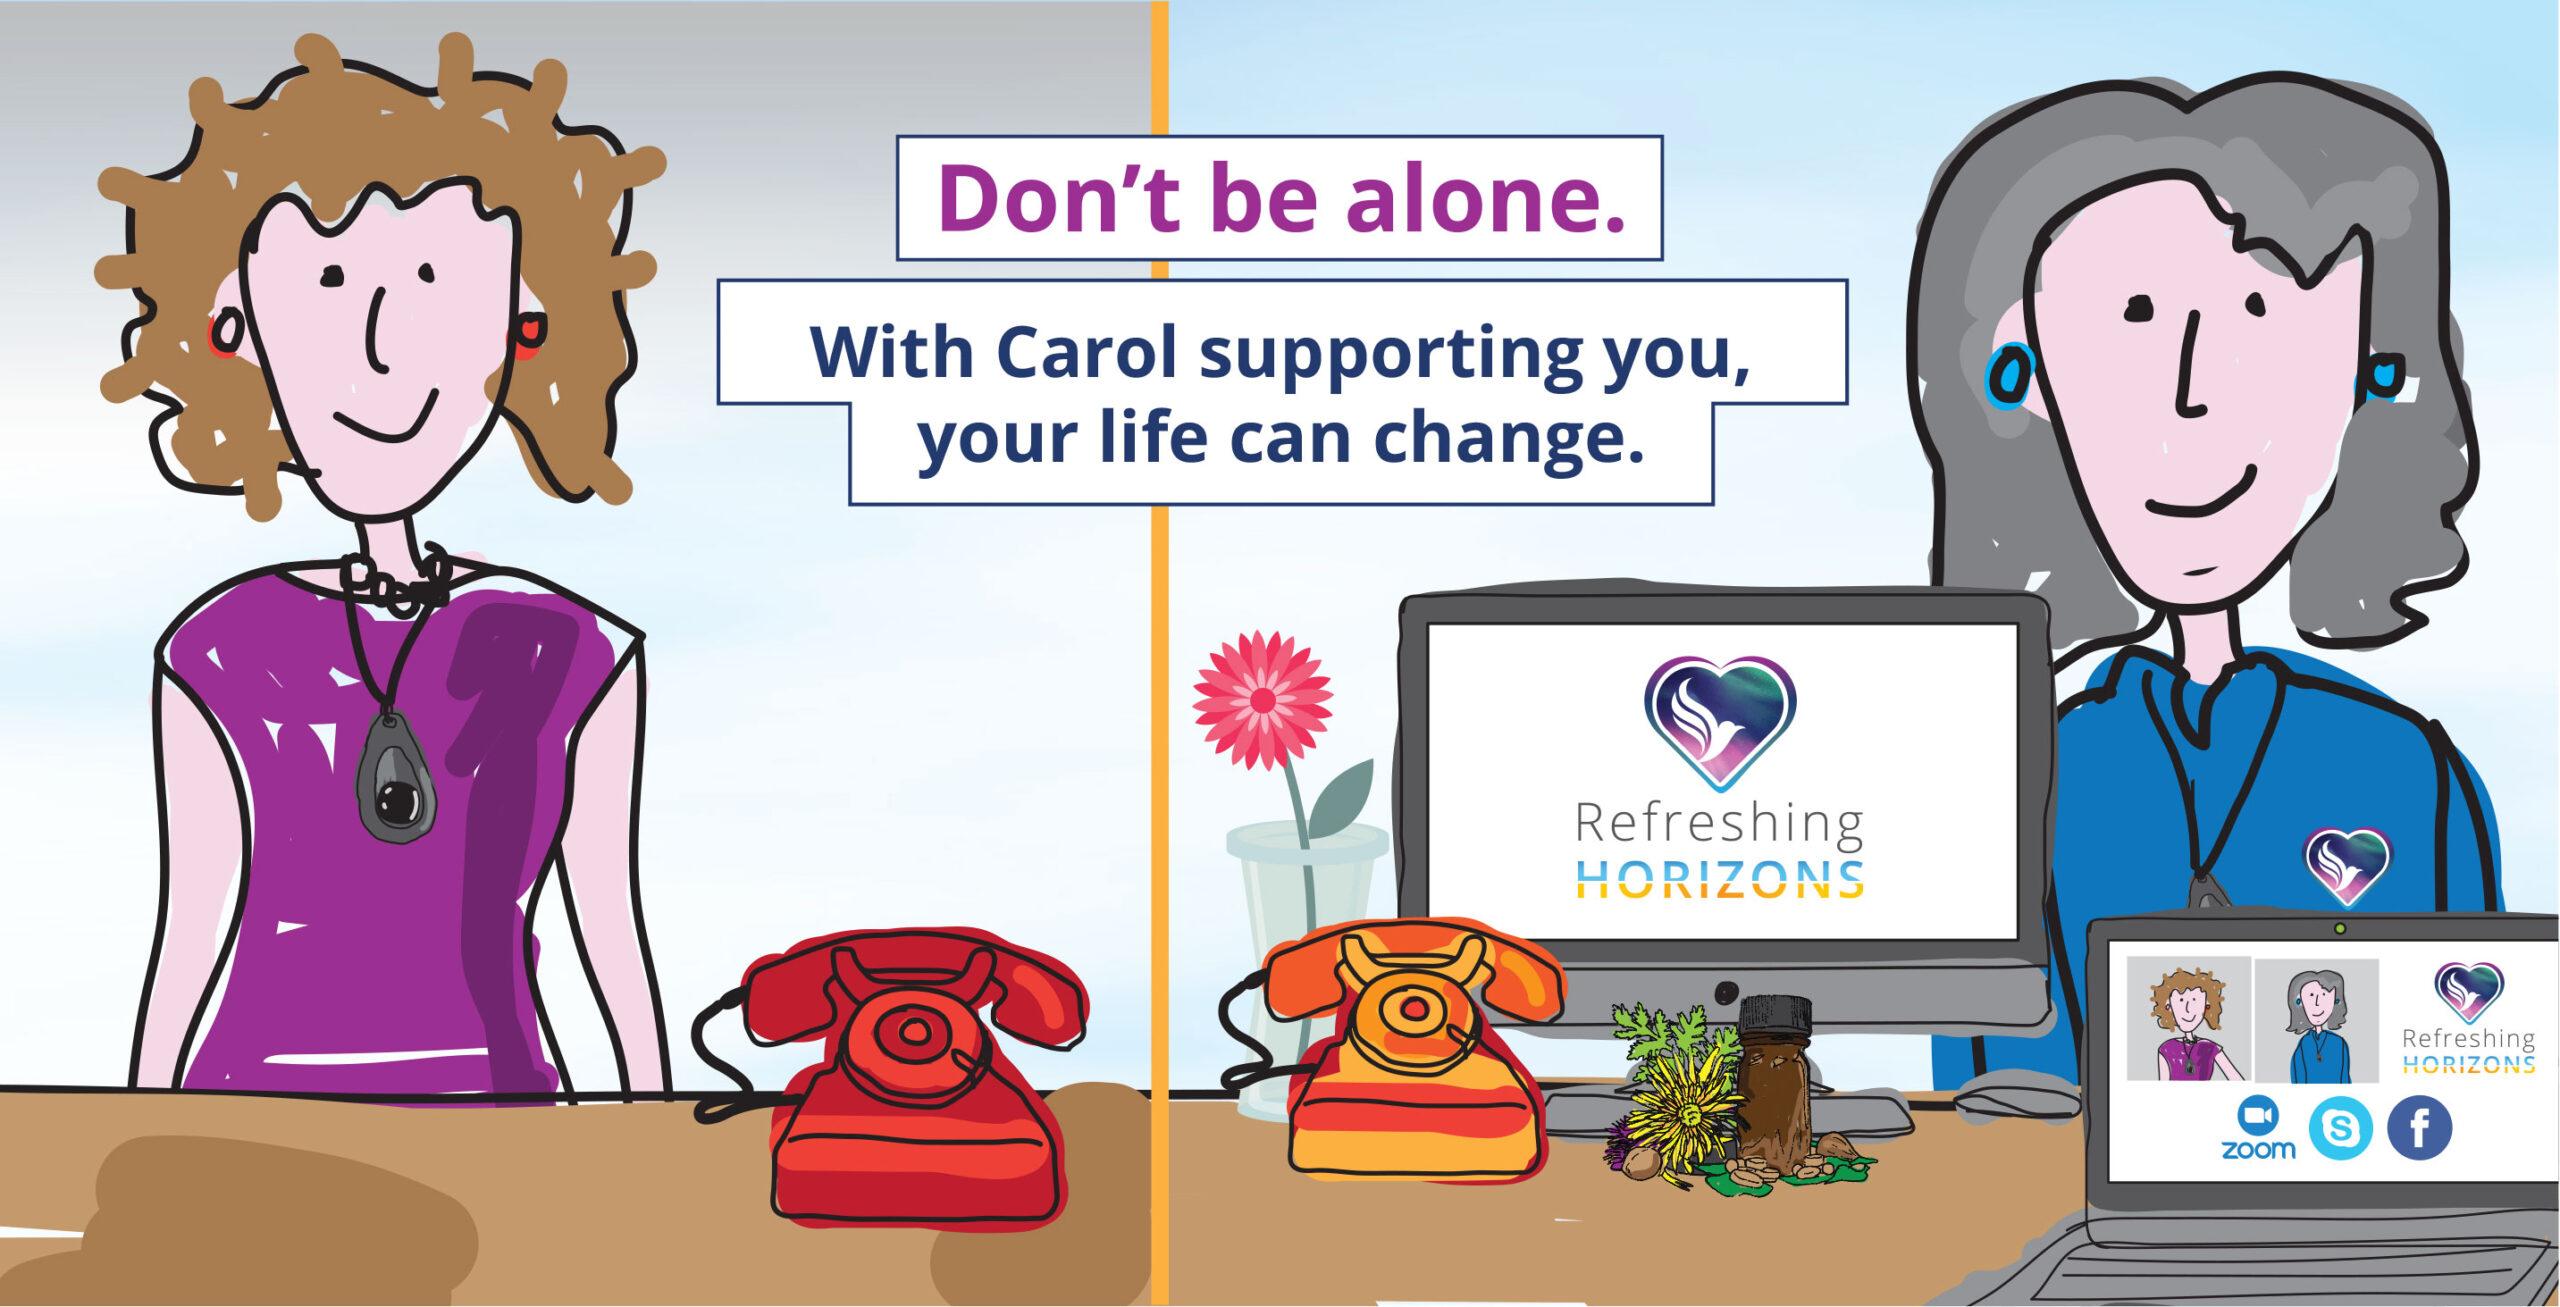 Call Carol